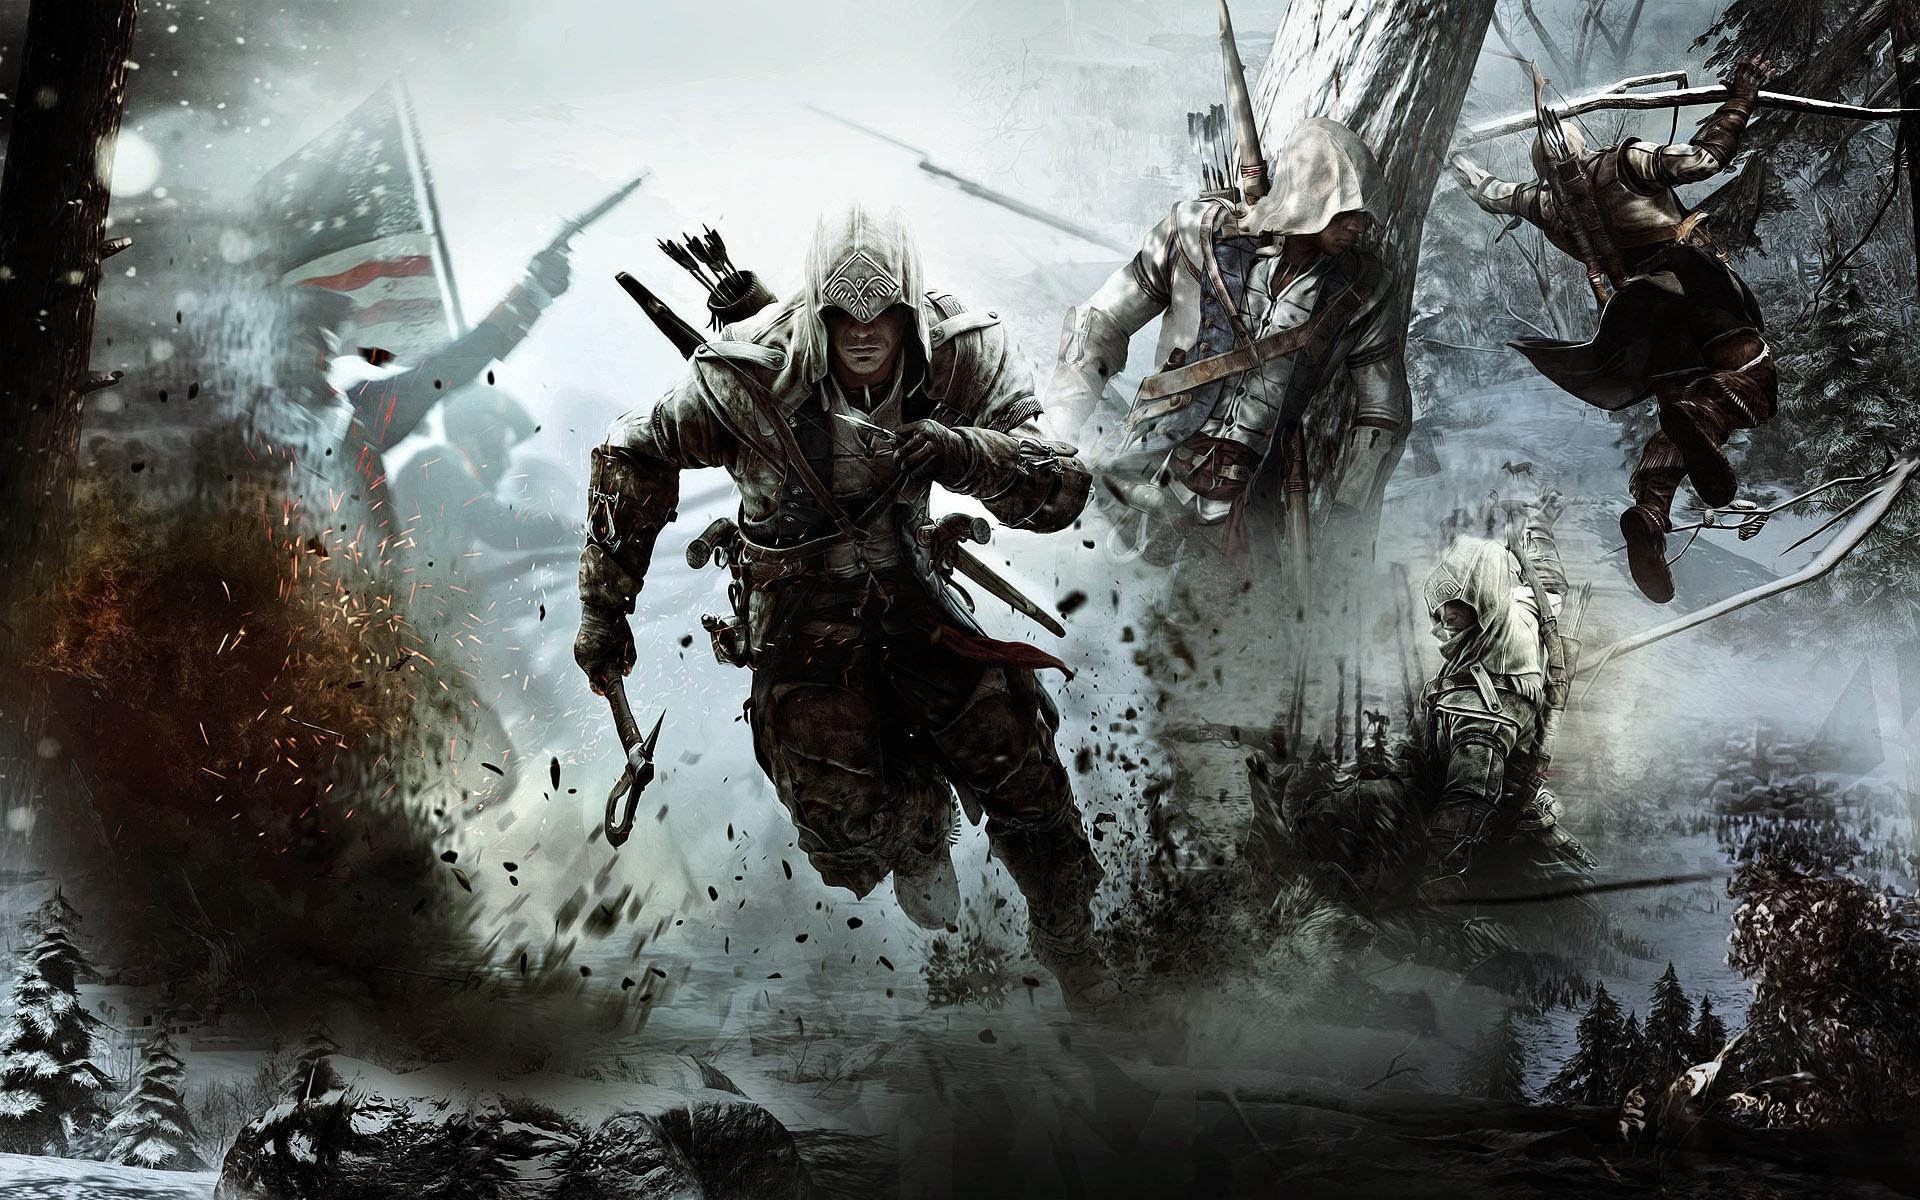 Assassins Creed 3 Wallpaper Hd 1080p Assassin`s creed 3 1920x1200